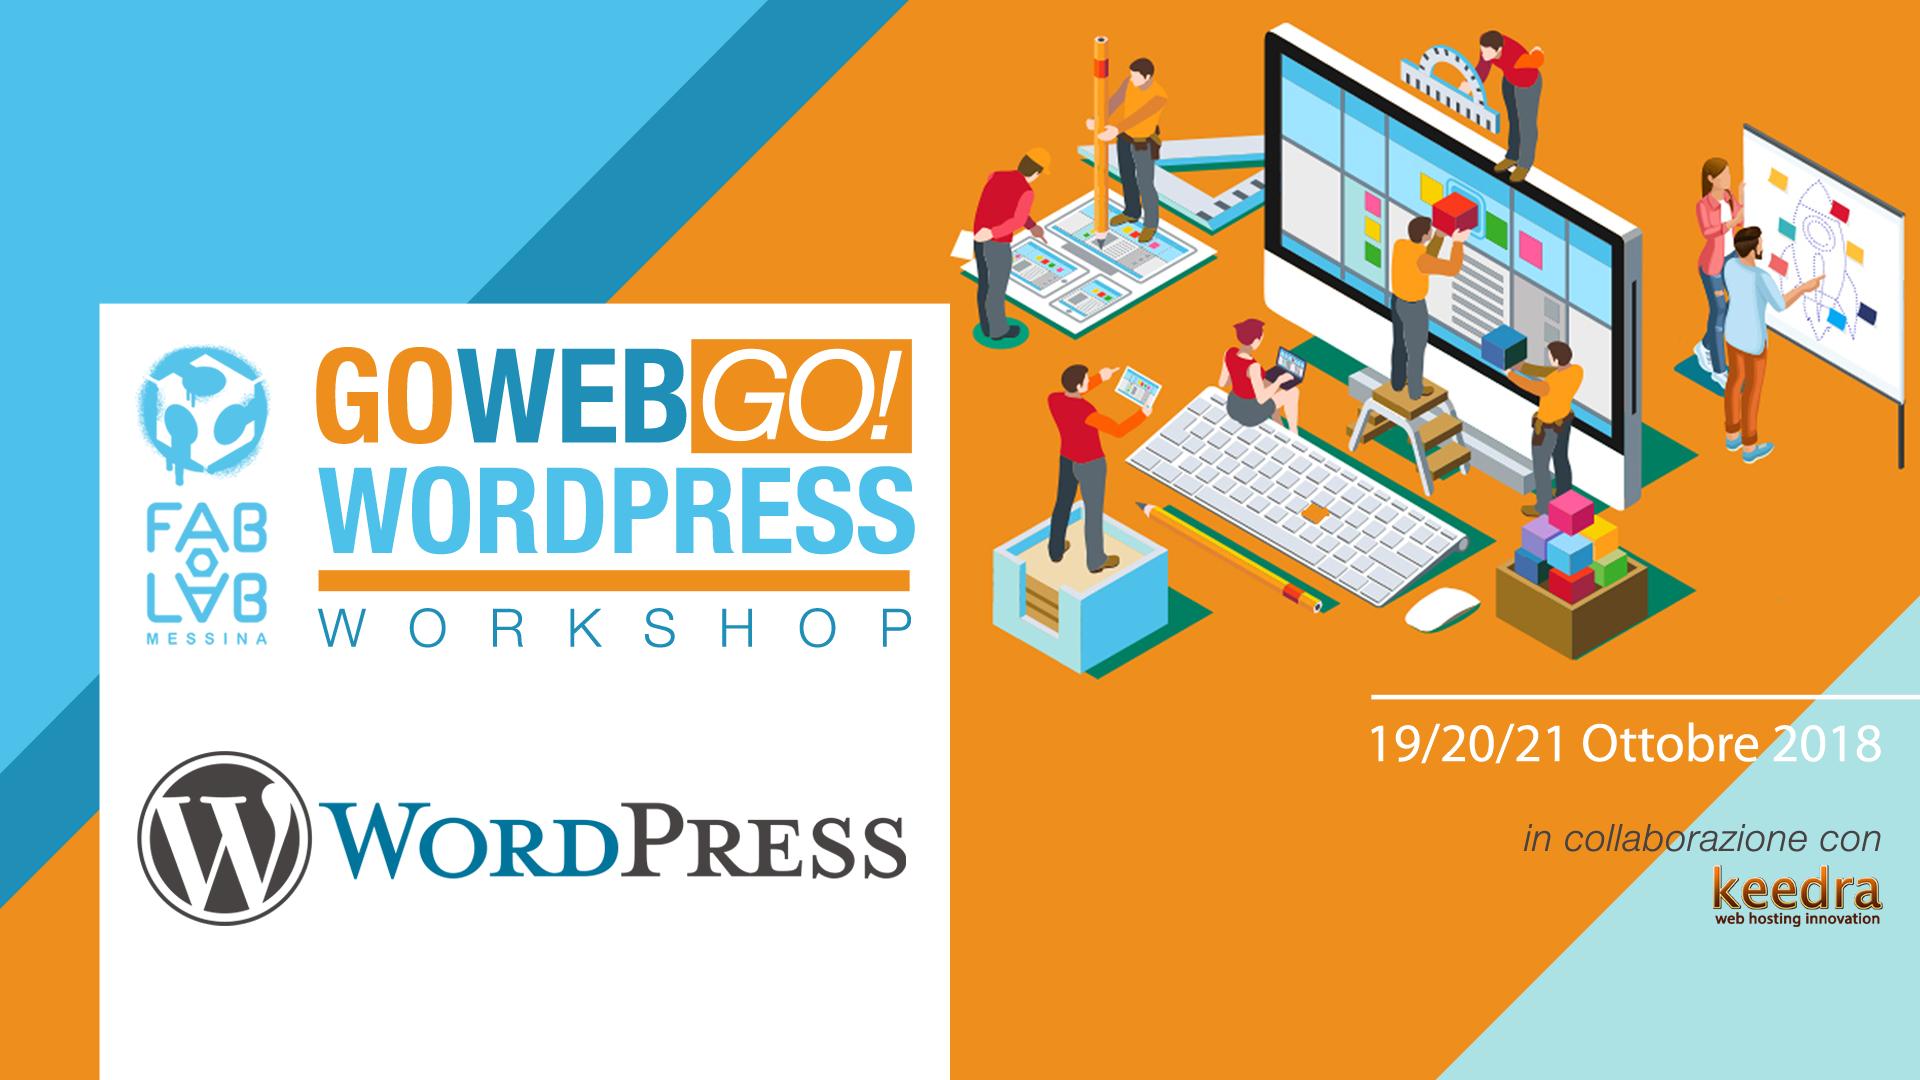 GoWebGo! – WordPress Workshop